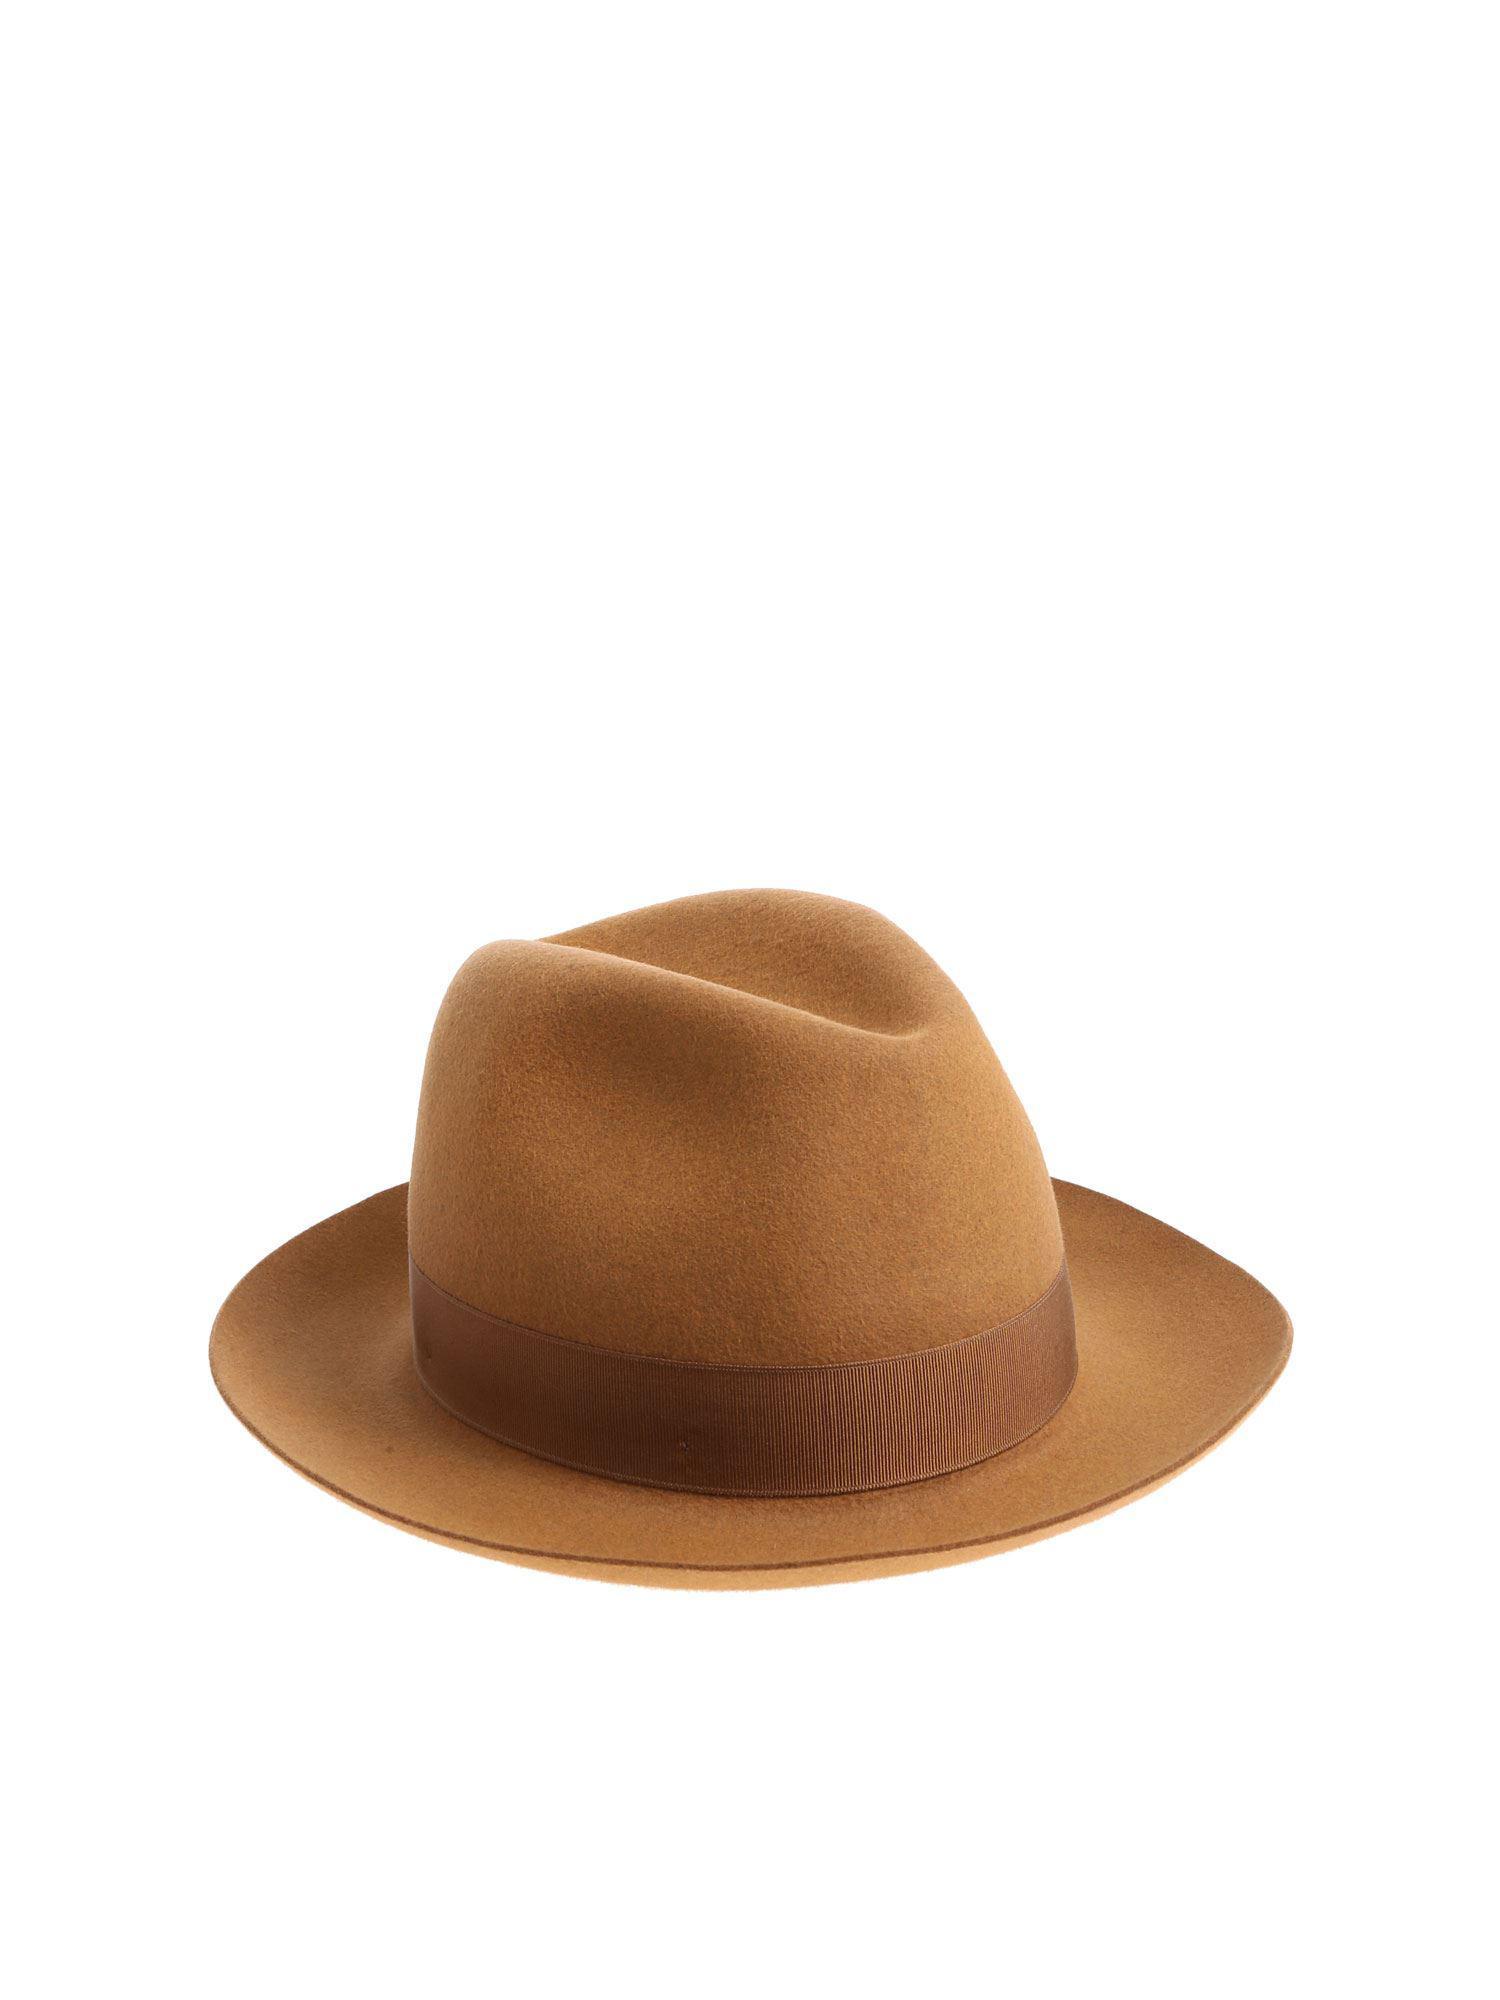 cb660c5fd2f Borsalino - Brown Camel Colored Felt Alessandria Hat for Men - Lyst. View  fullscreen